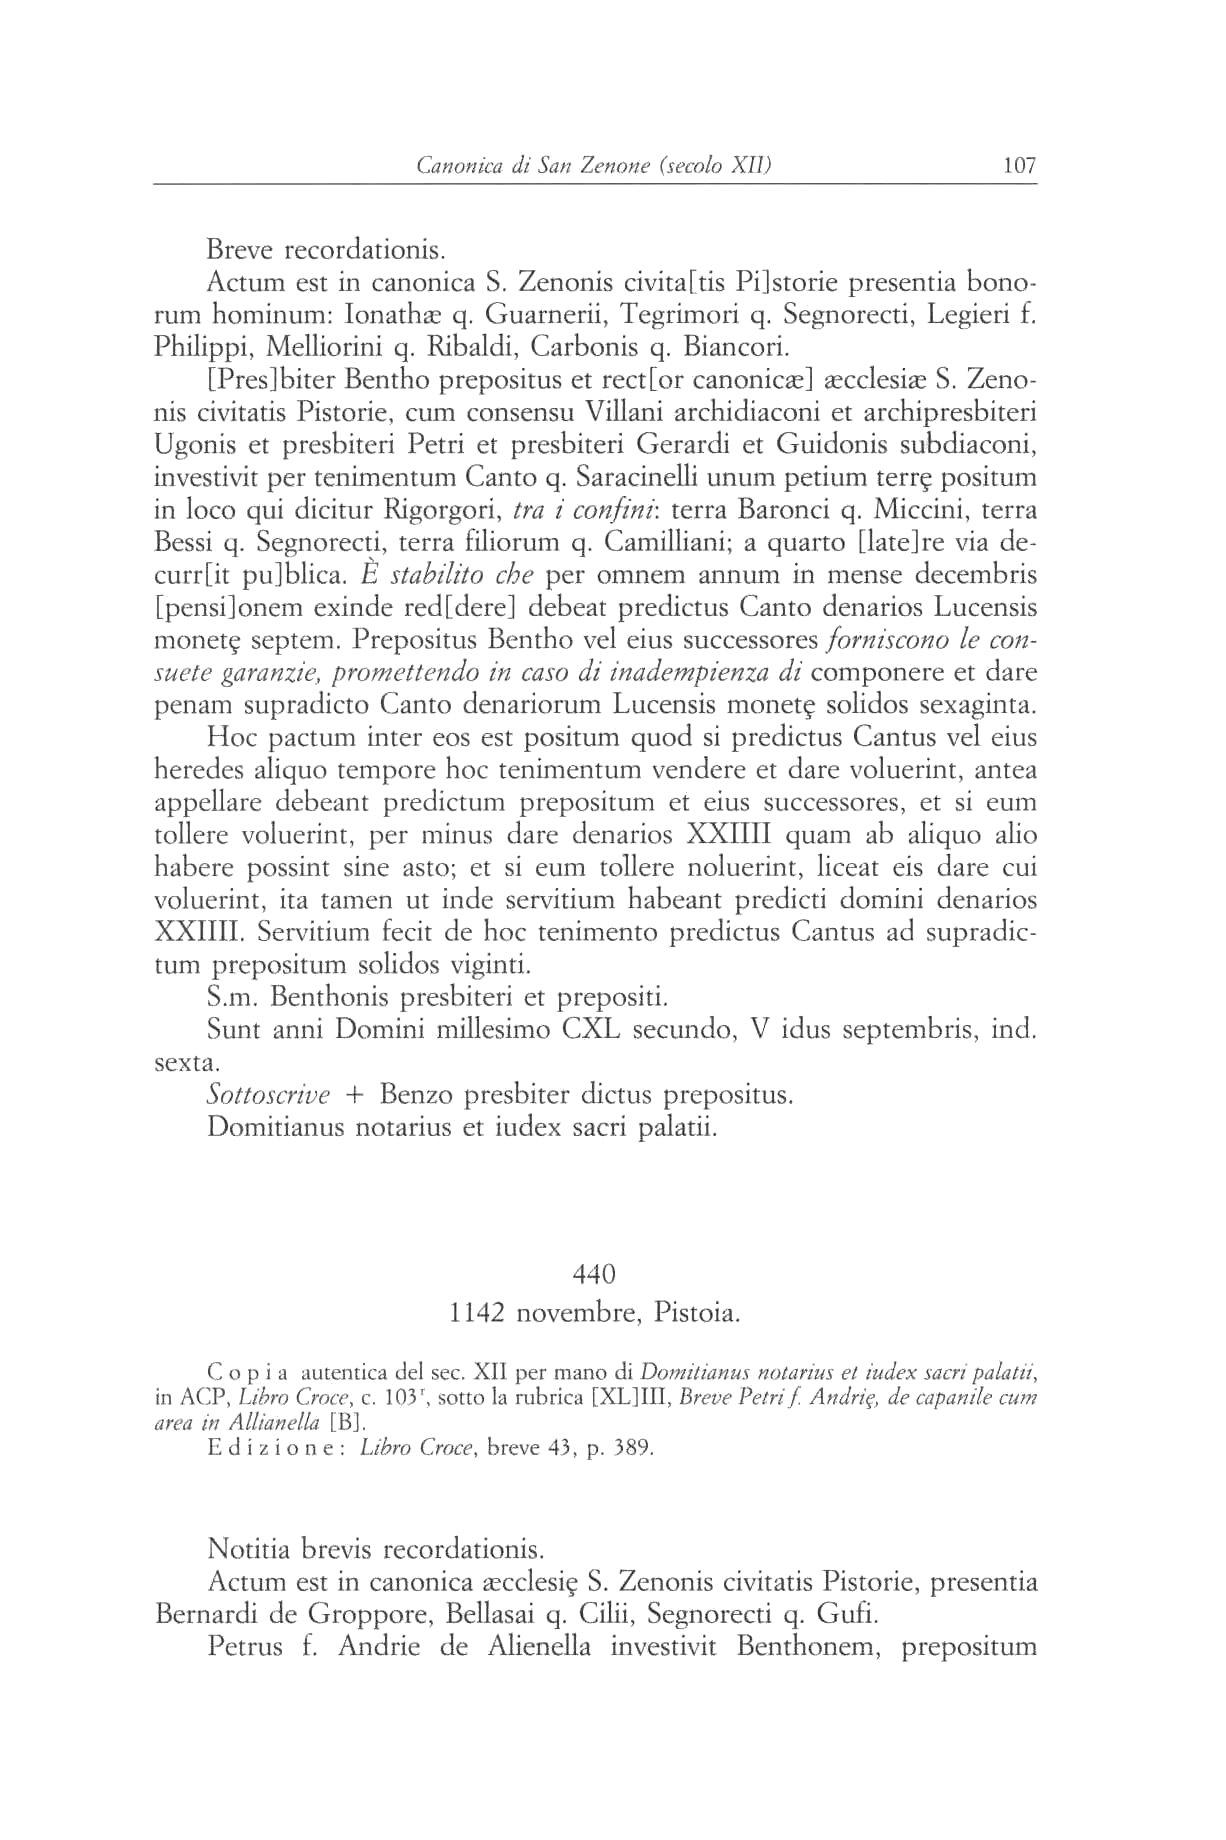 Canonica S. Zenone XII 0107.jpg